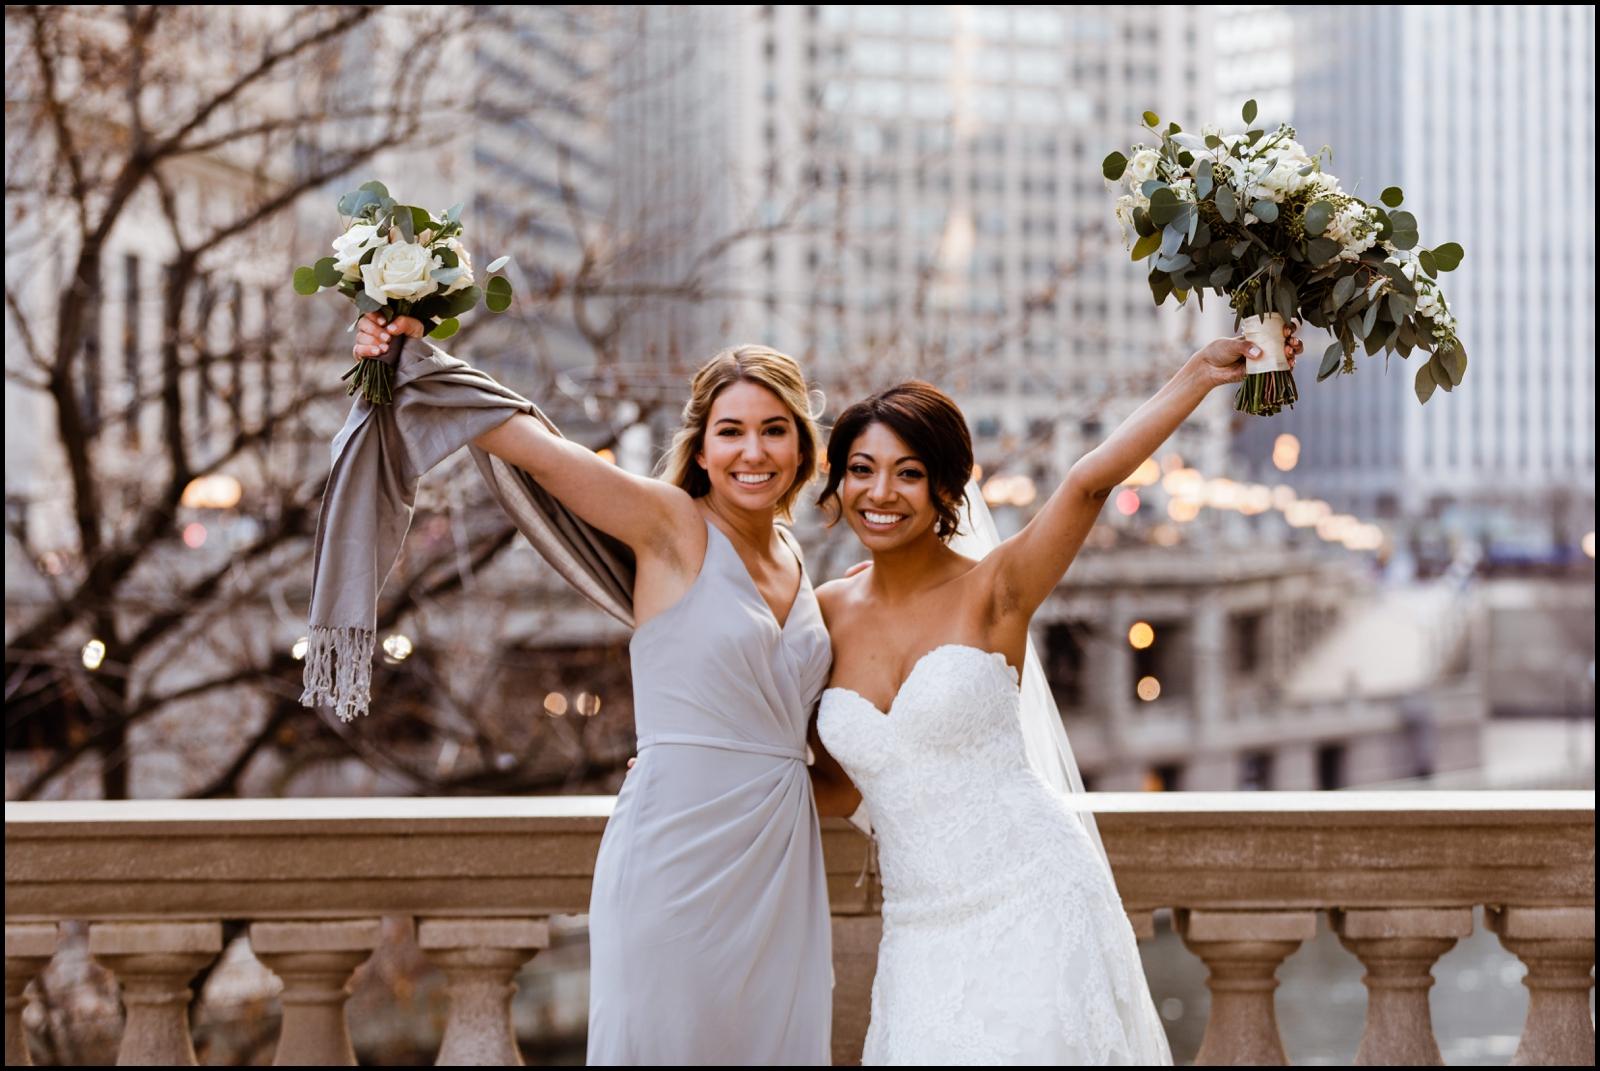 Chicago Wedding- Alice Millar Chapel Ceremony, London House Reception_0089.jpg